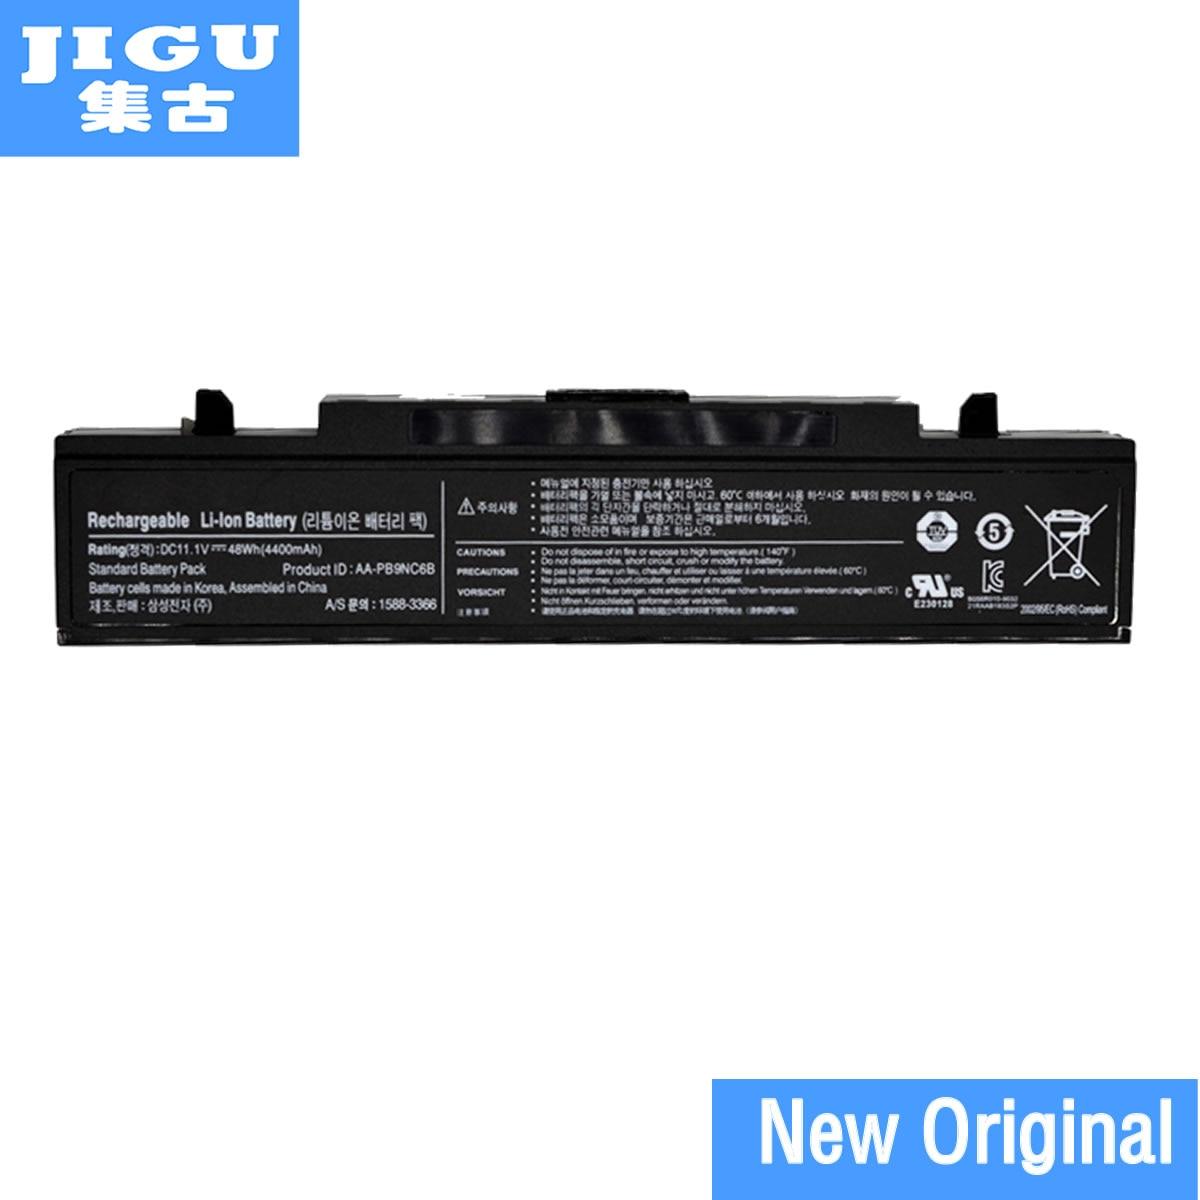 JIGU Original Laptop Battery For SAMSUNG R718 R720 R728 R730 R780 RC410 RC510 RC512 RC710 RC730 RF410 RF411 RF510 RF511 цена